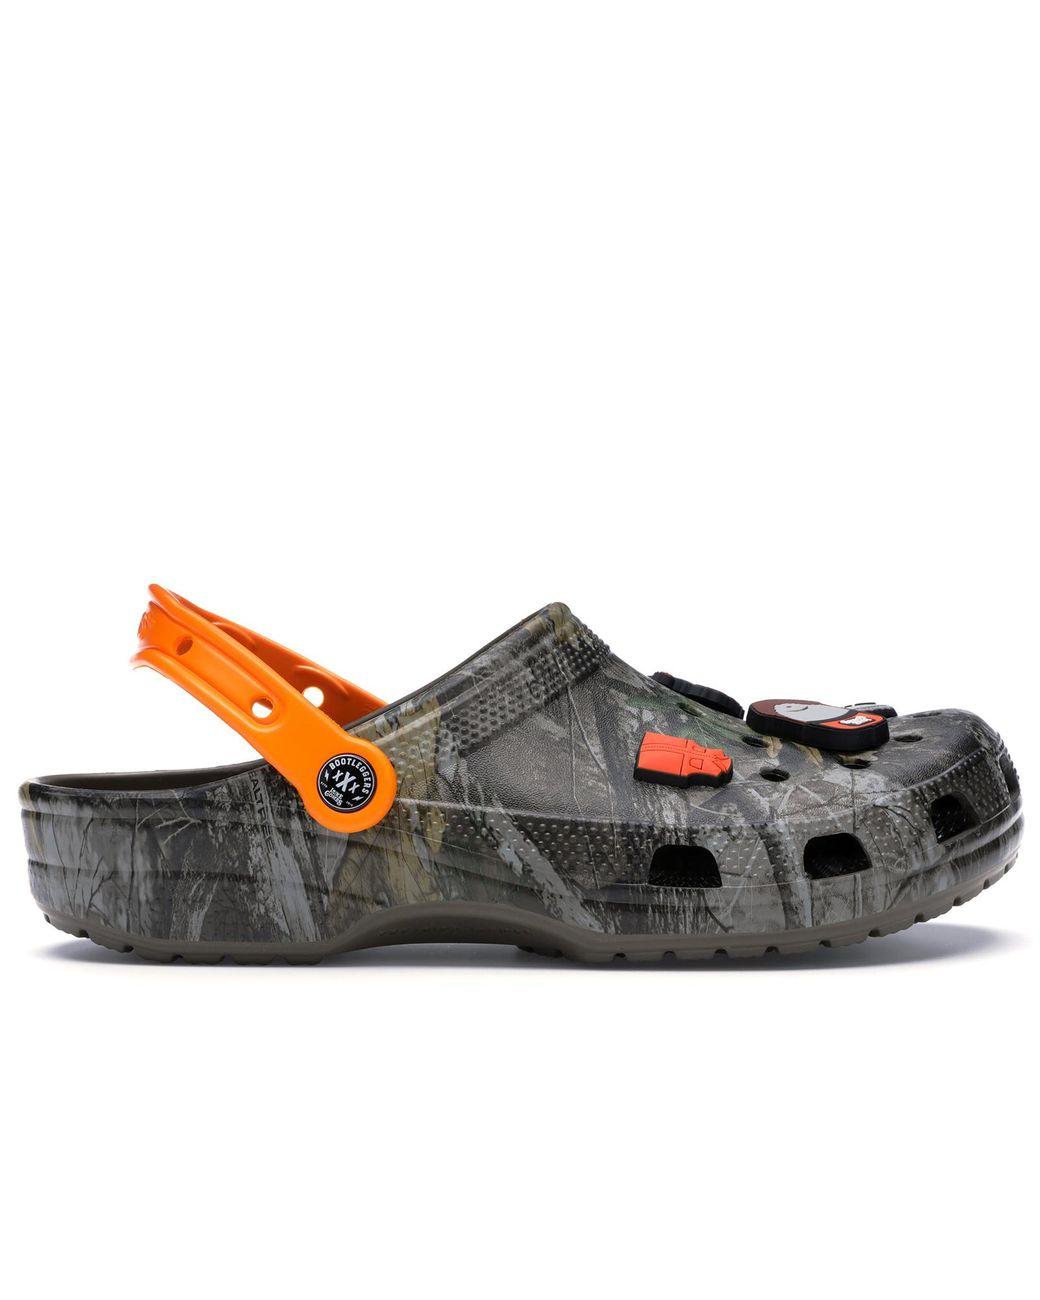 Crocs Classic Clog Luke Combs Realtree Camo For Men Lyst